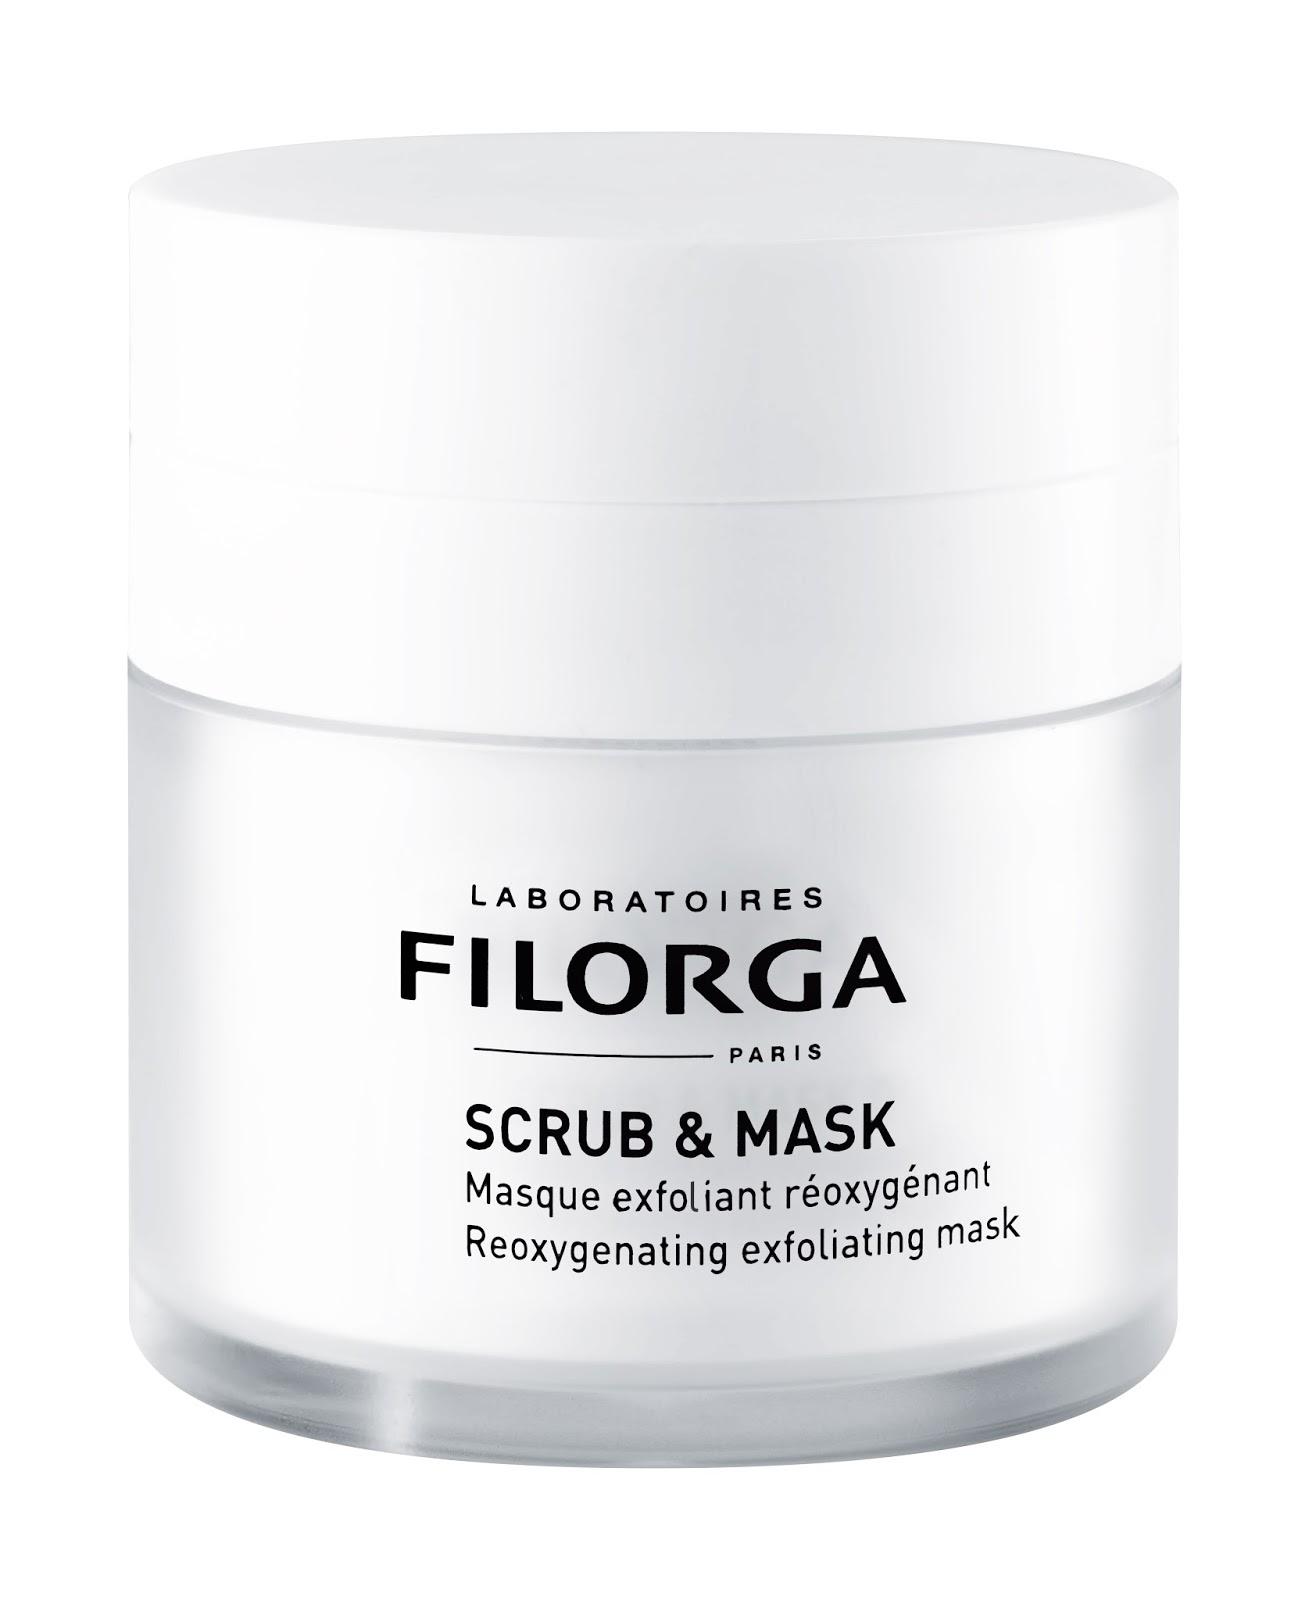 d maquillages blog beaut les masques effervescents le match garancia x sephora x filorga. Black Bedroom Furniture Sets. Home Design Ideas